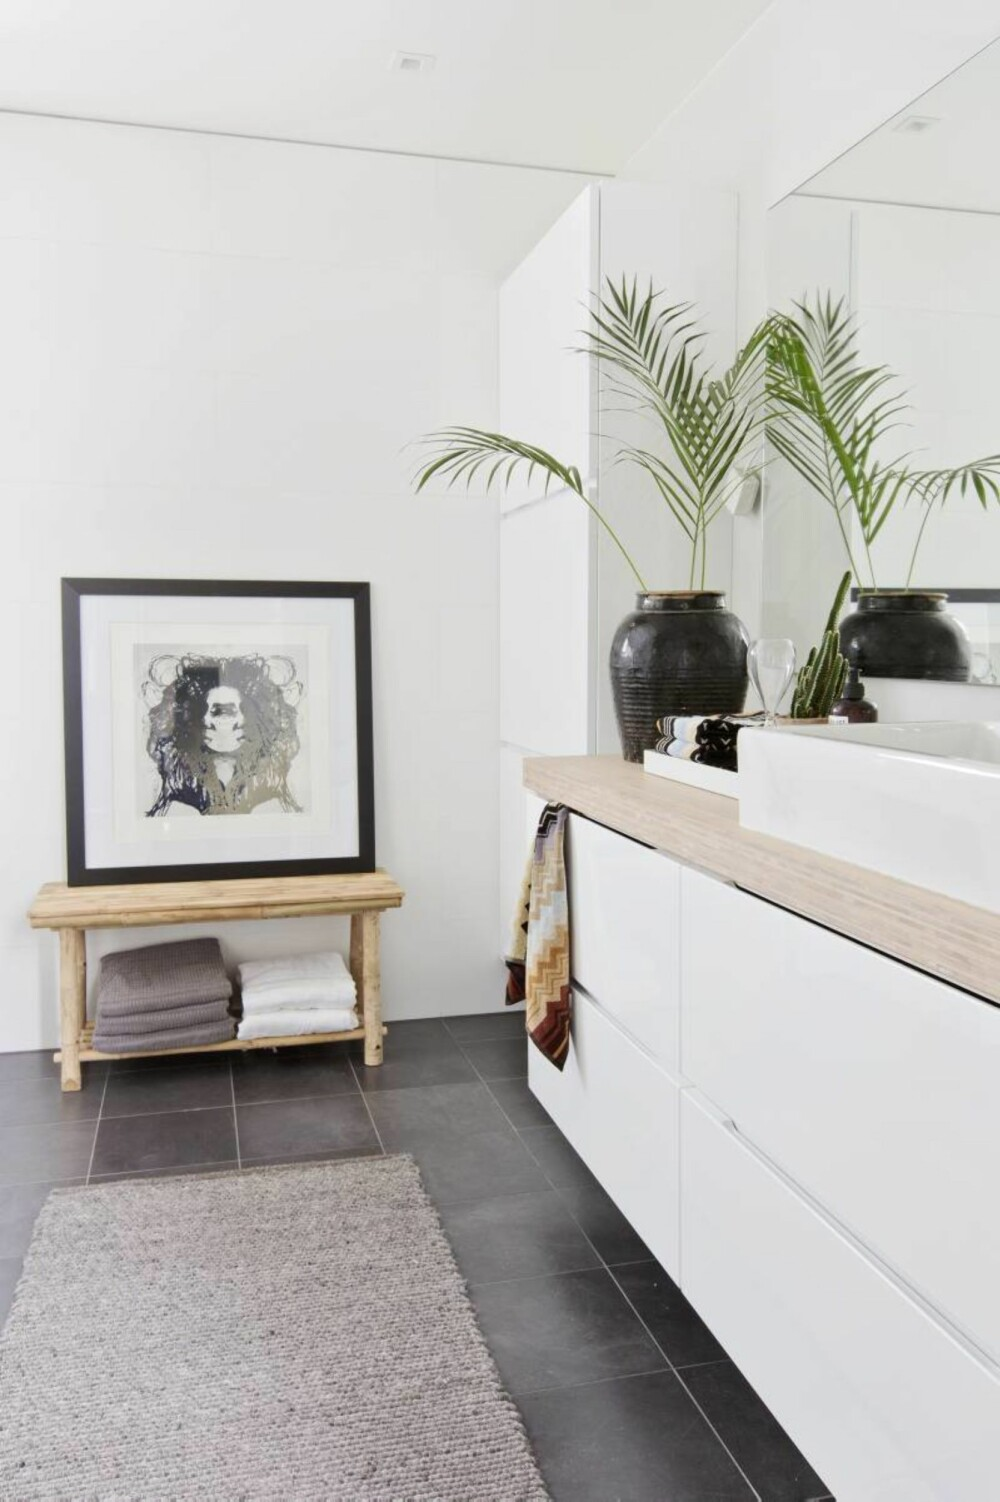 Idé fra magasin. Ideen fra planløsningen på badet fant Anna i et interiørblad. Gulvet har fliser fra Höganäs.